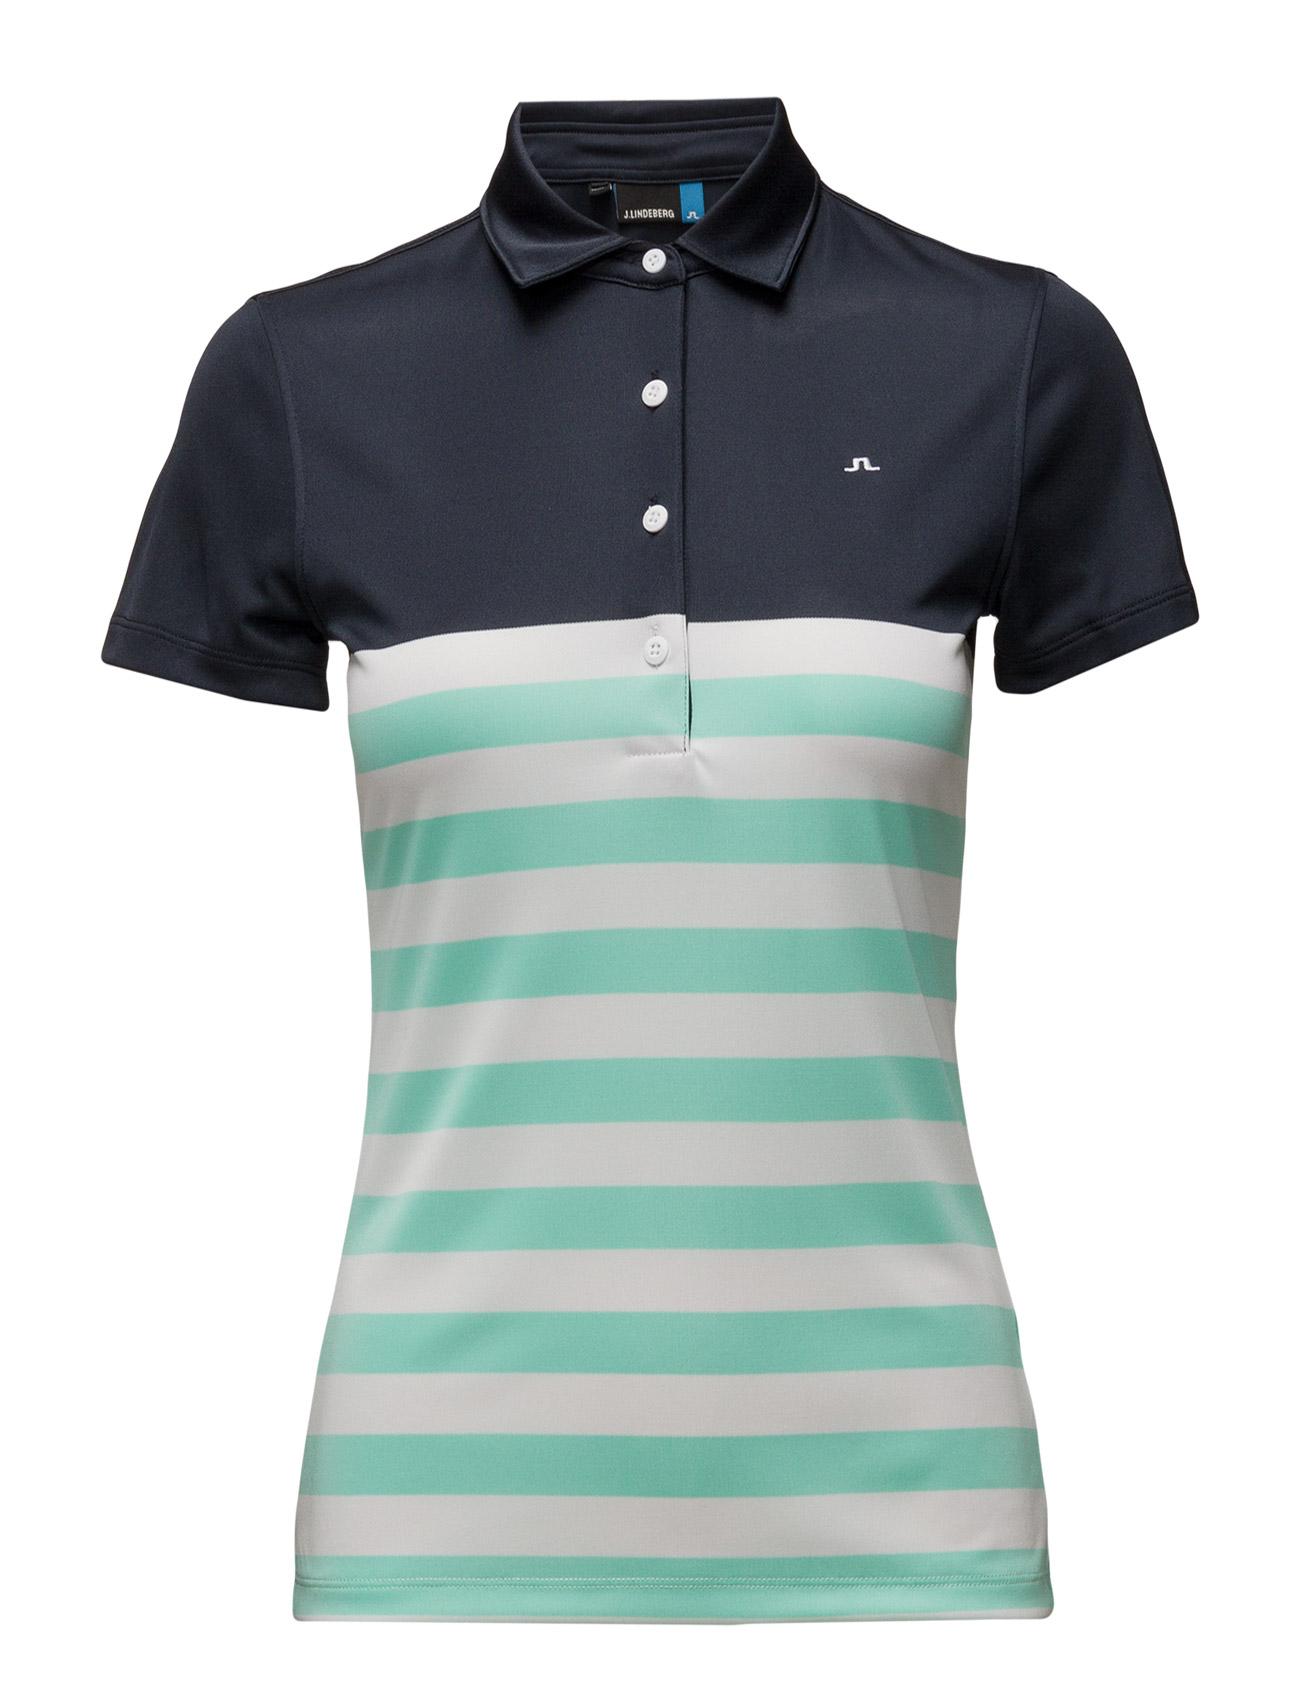 j. lindeberg golf – W caroline tx jersey fra boozt.com dk